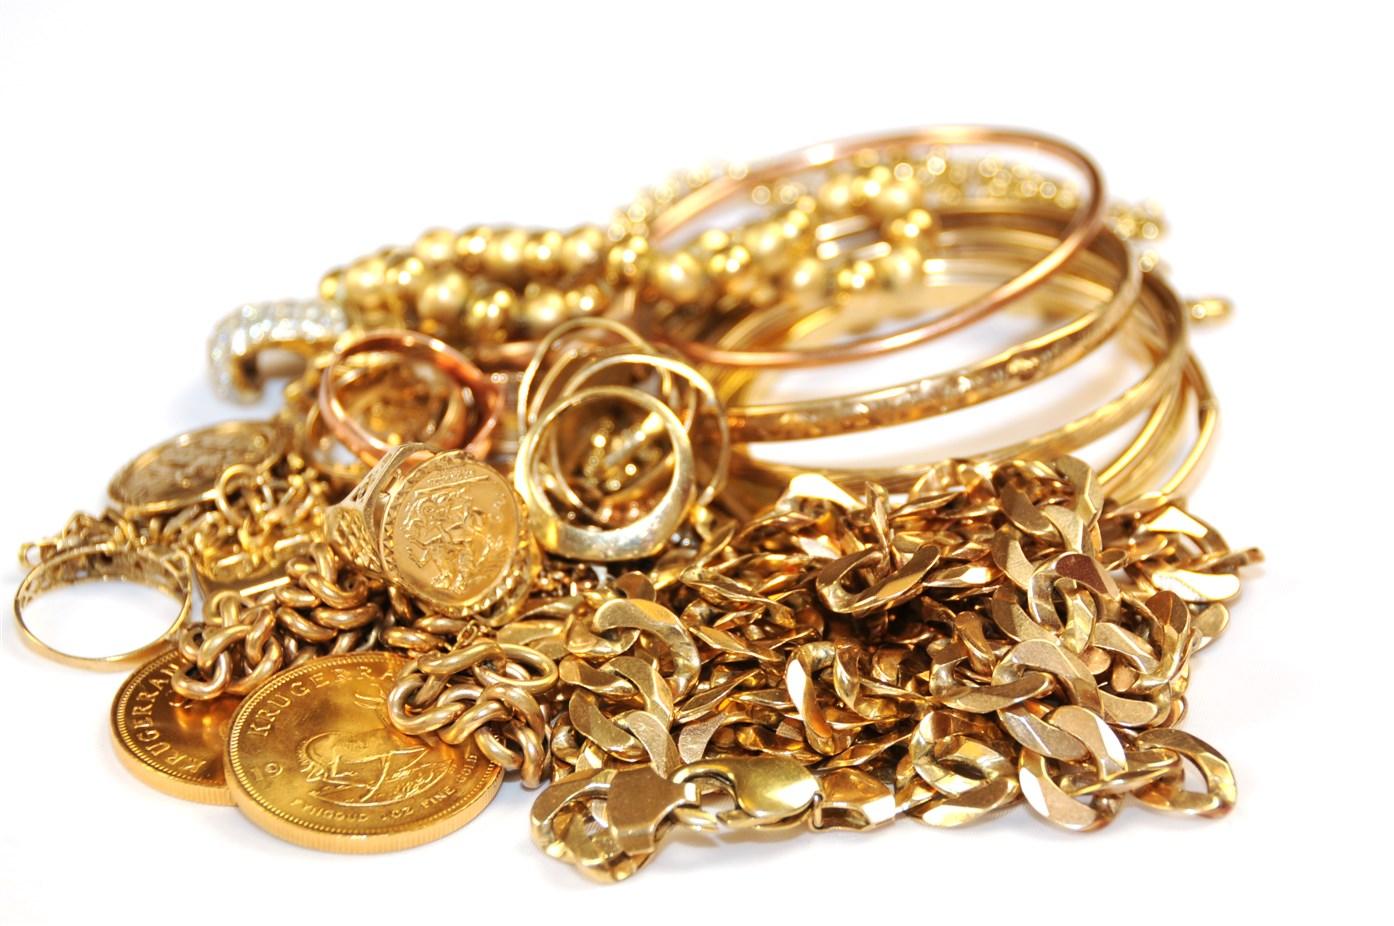 scrap jewellery1 (1394 x 926)